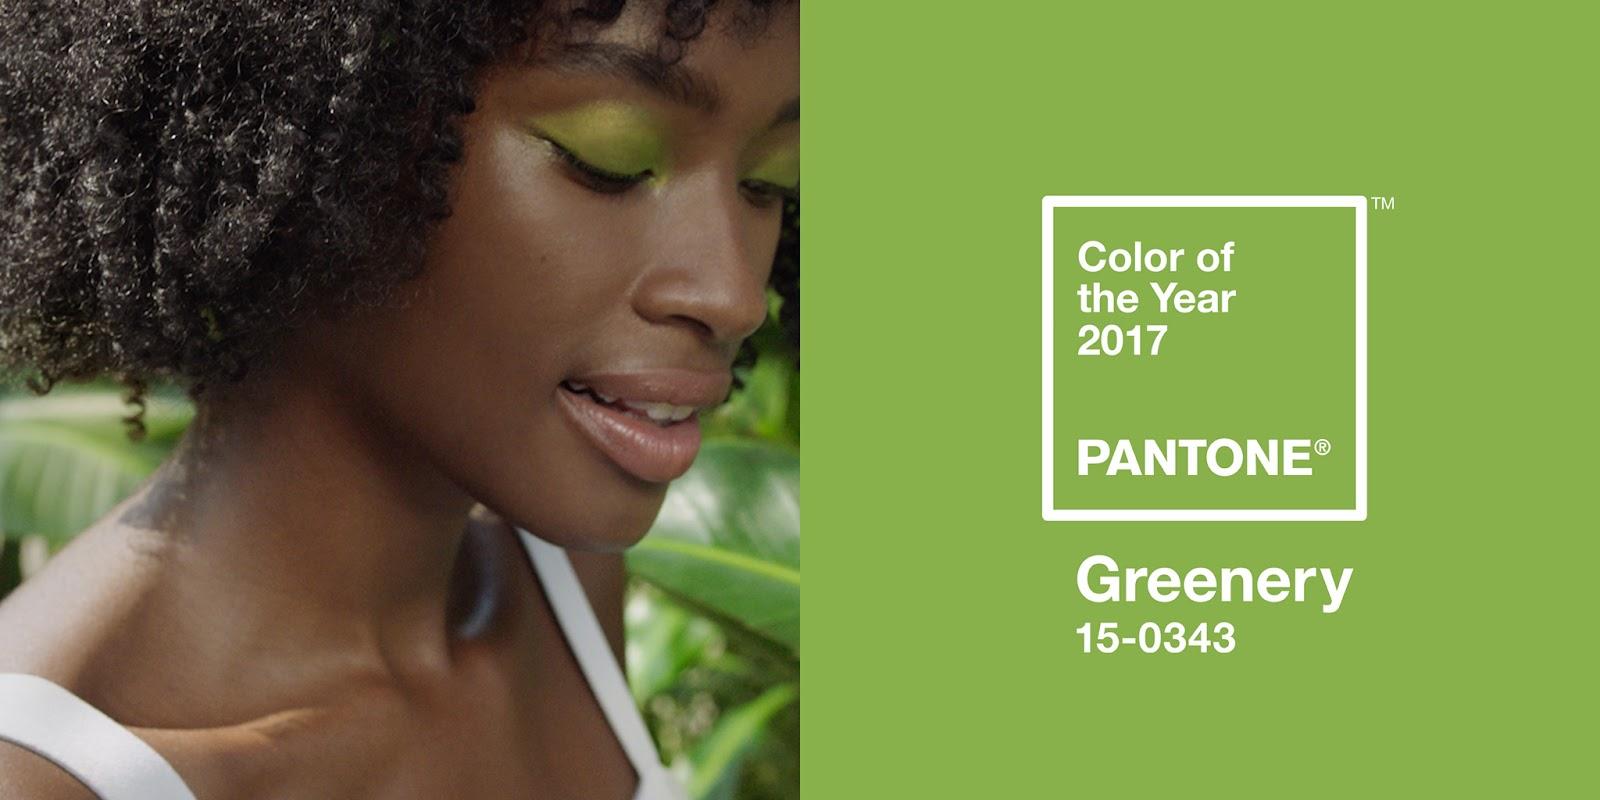 a black woman with green eyeshadow